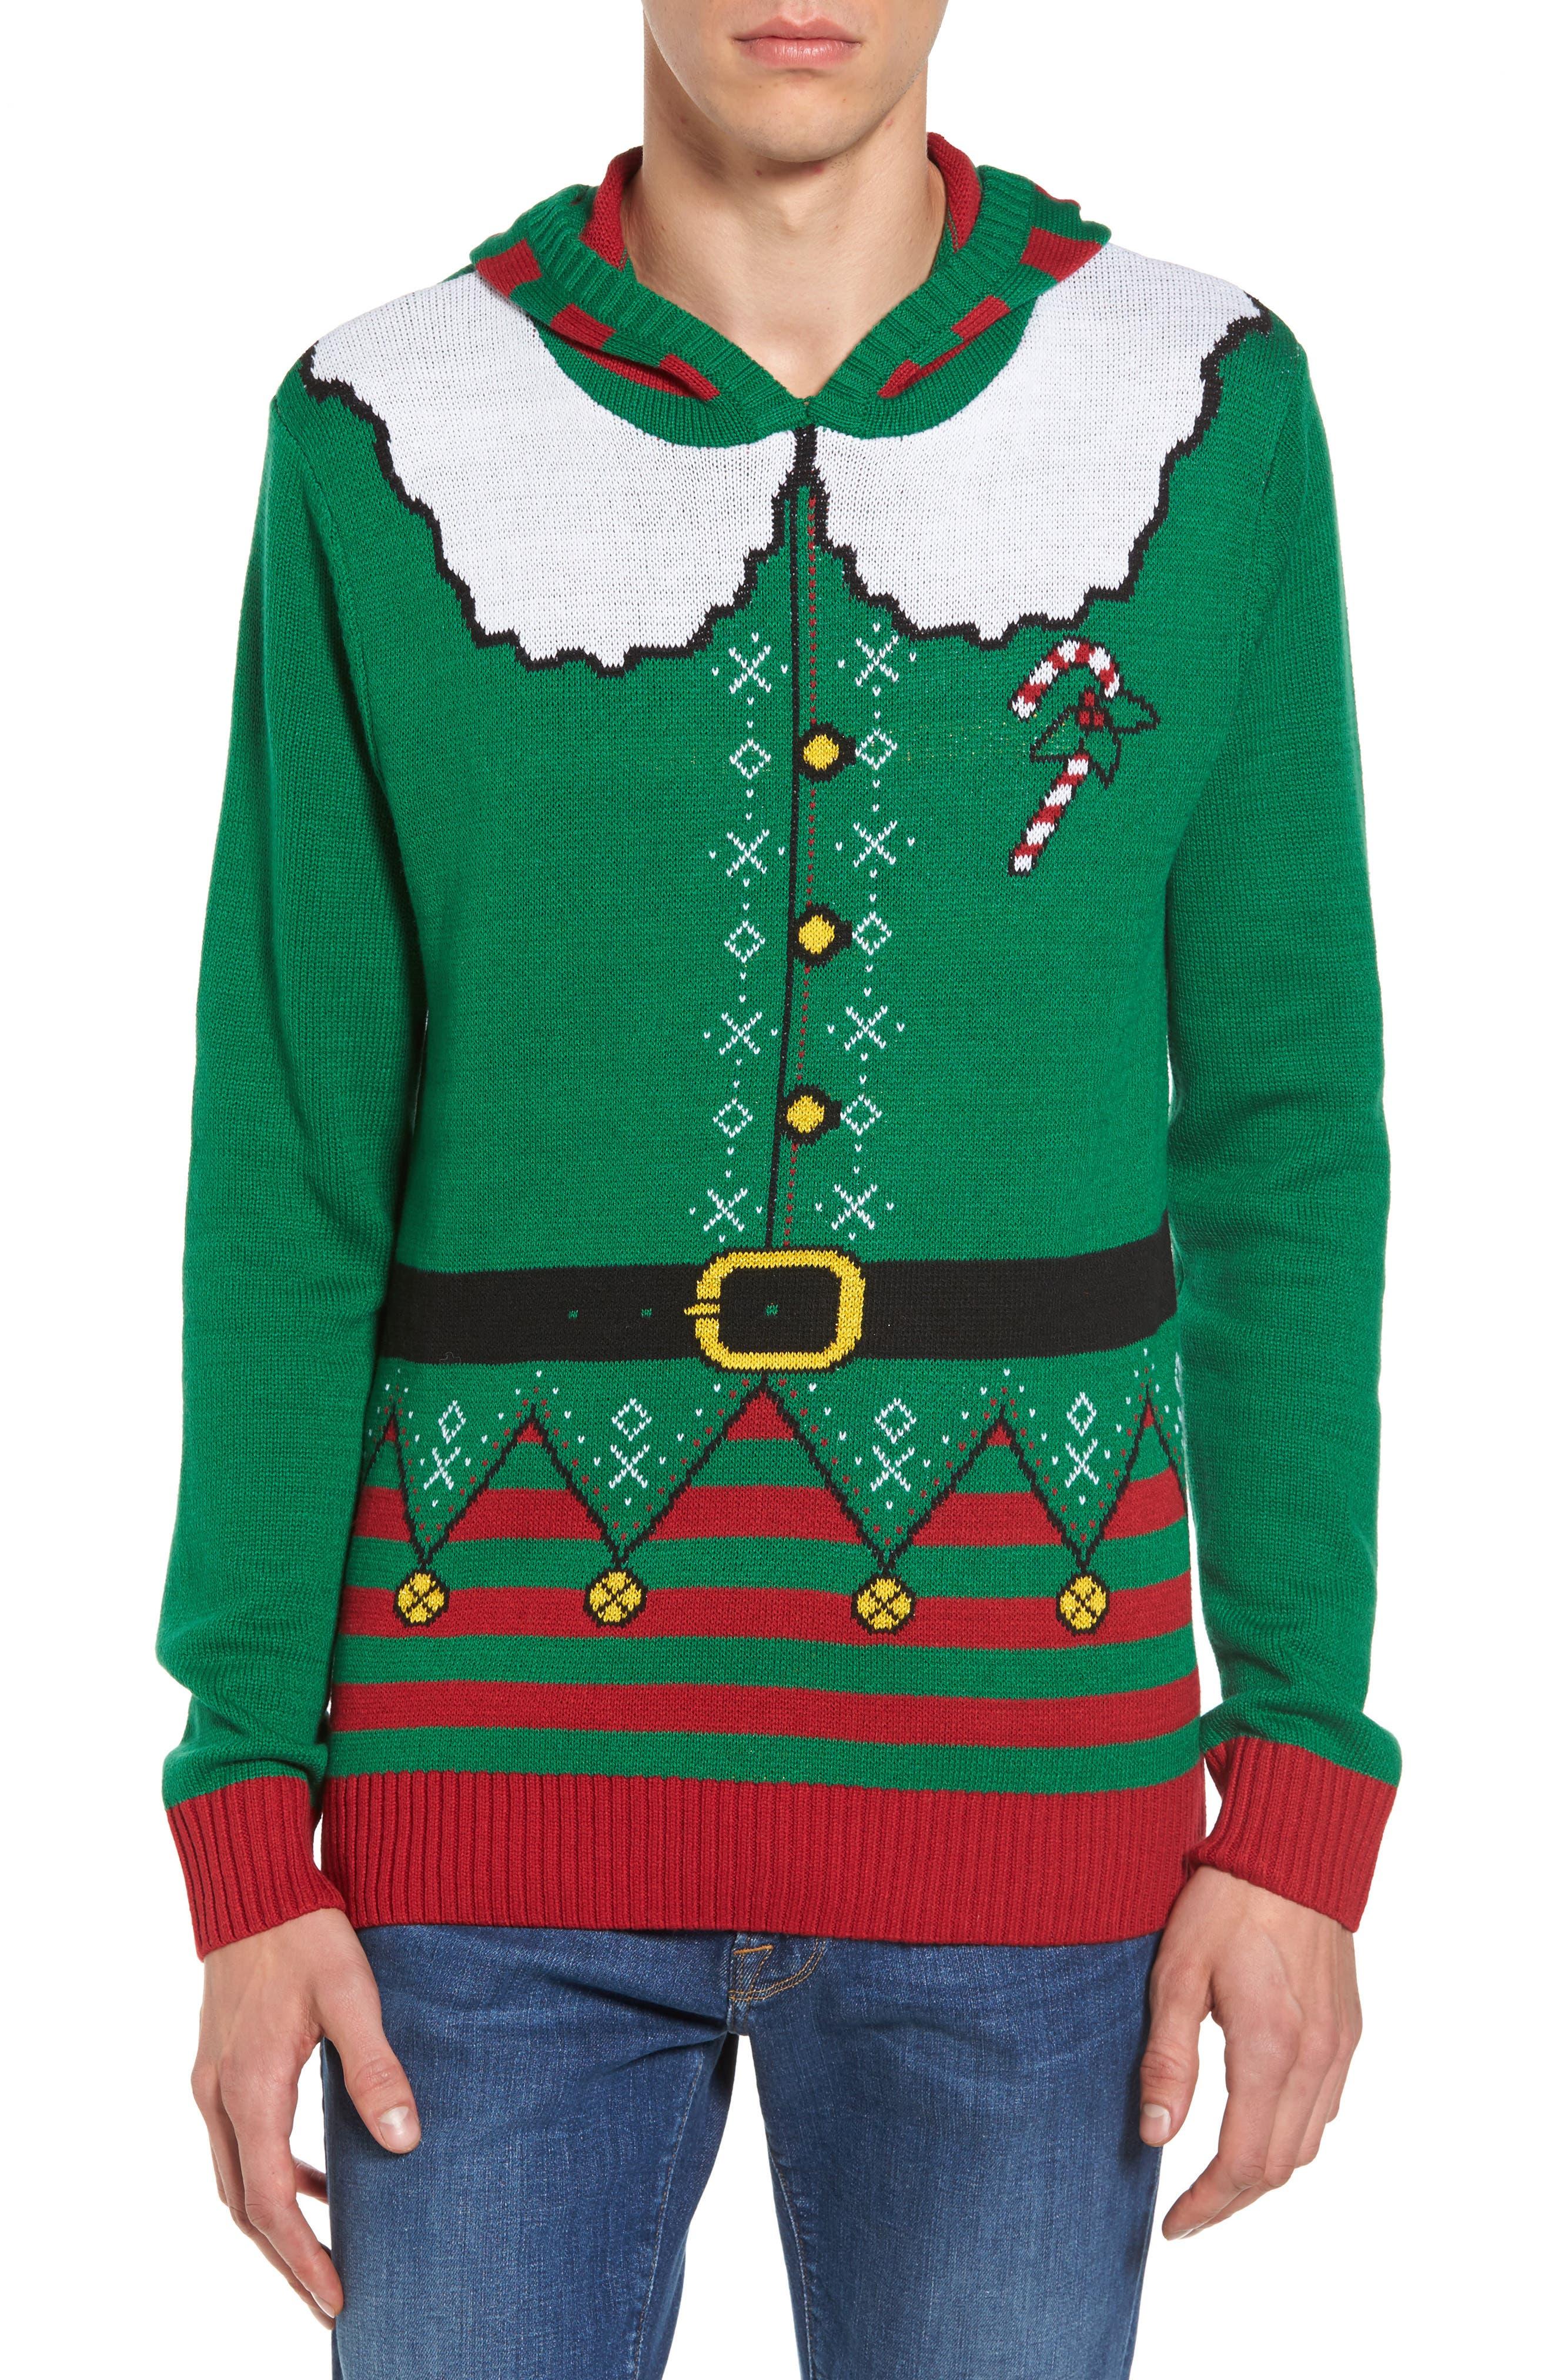 The Rail Elf Hooded Sweater